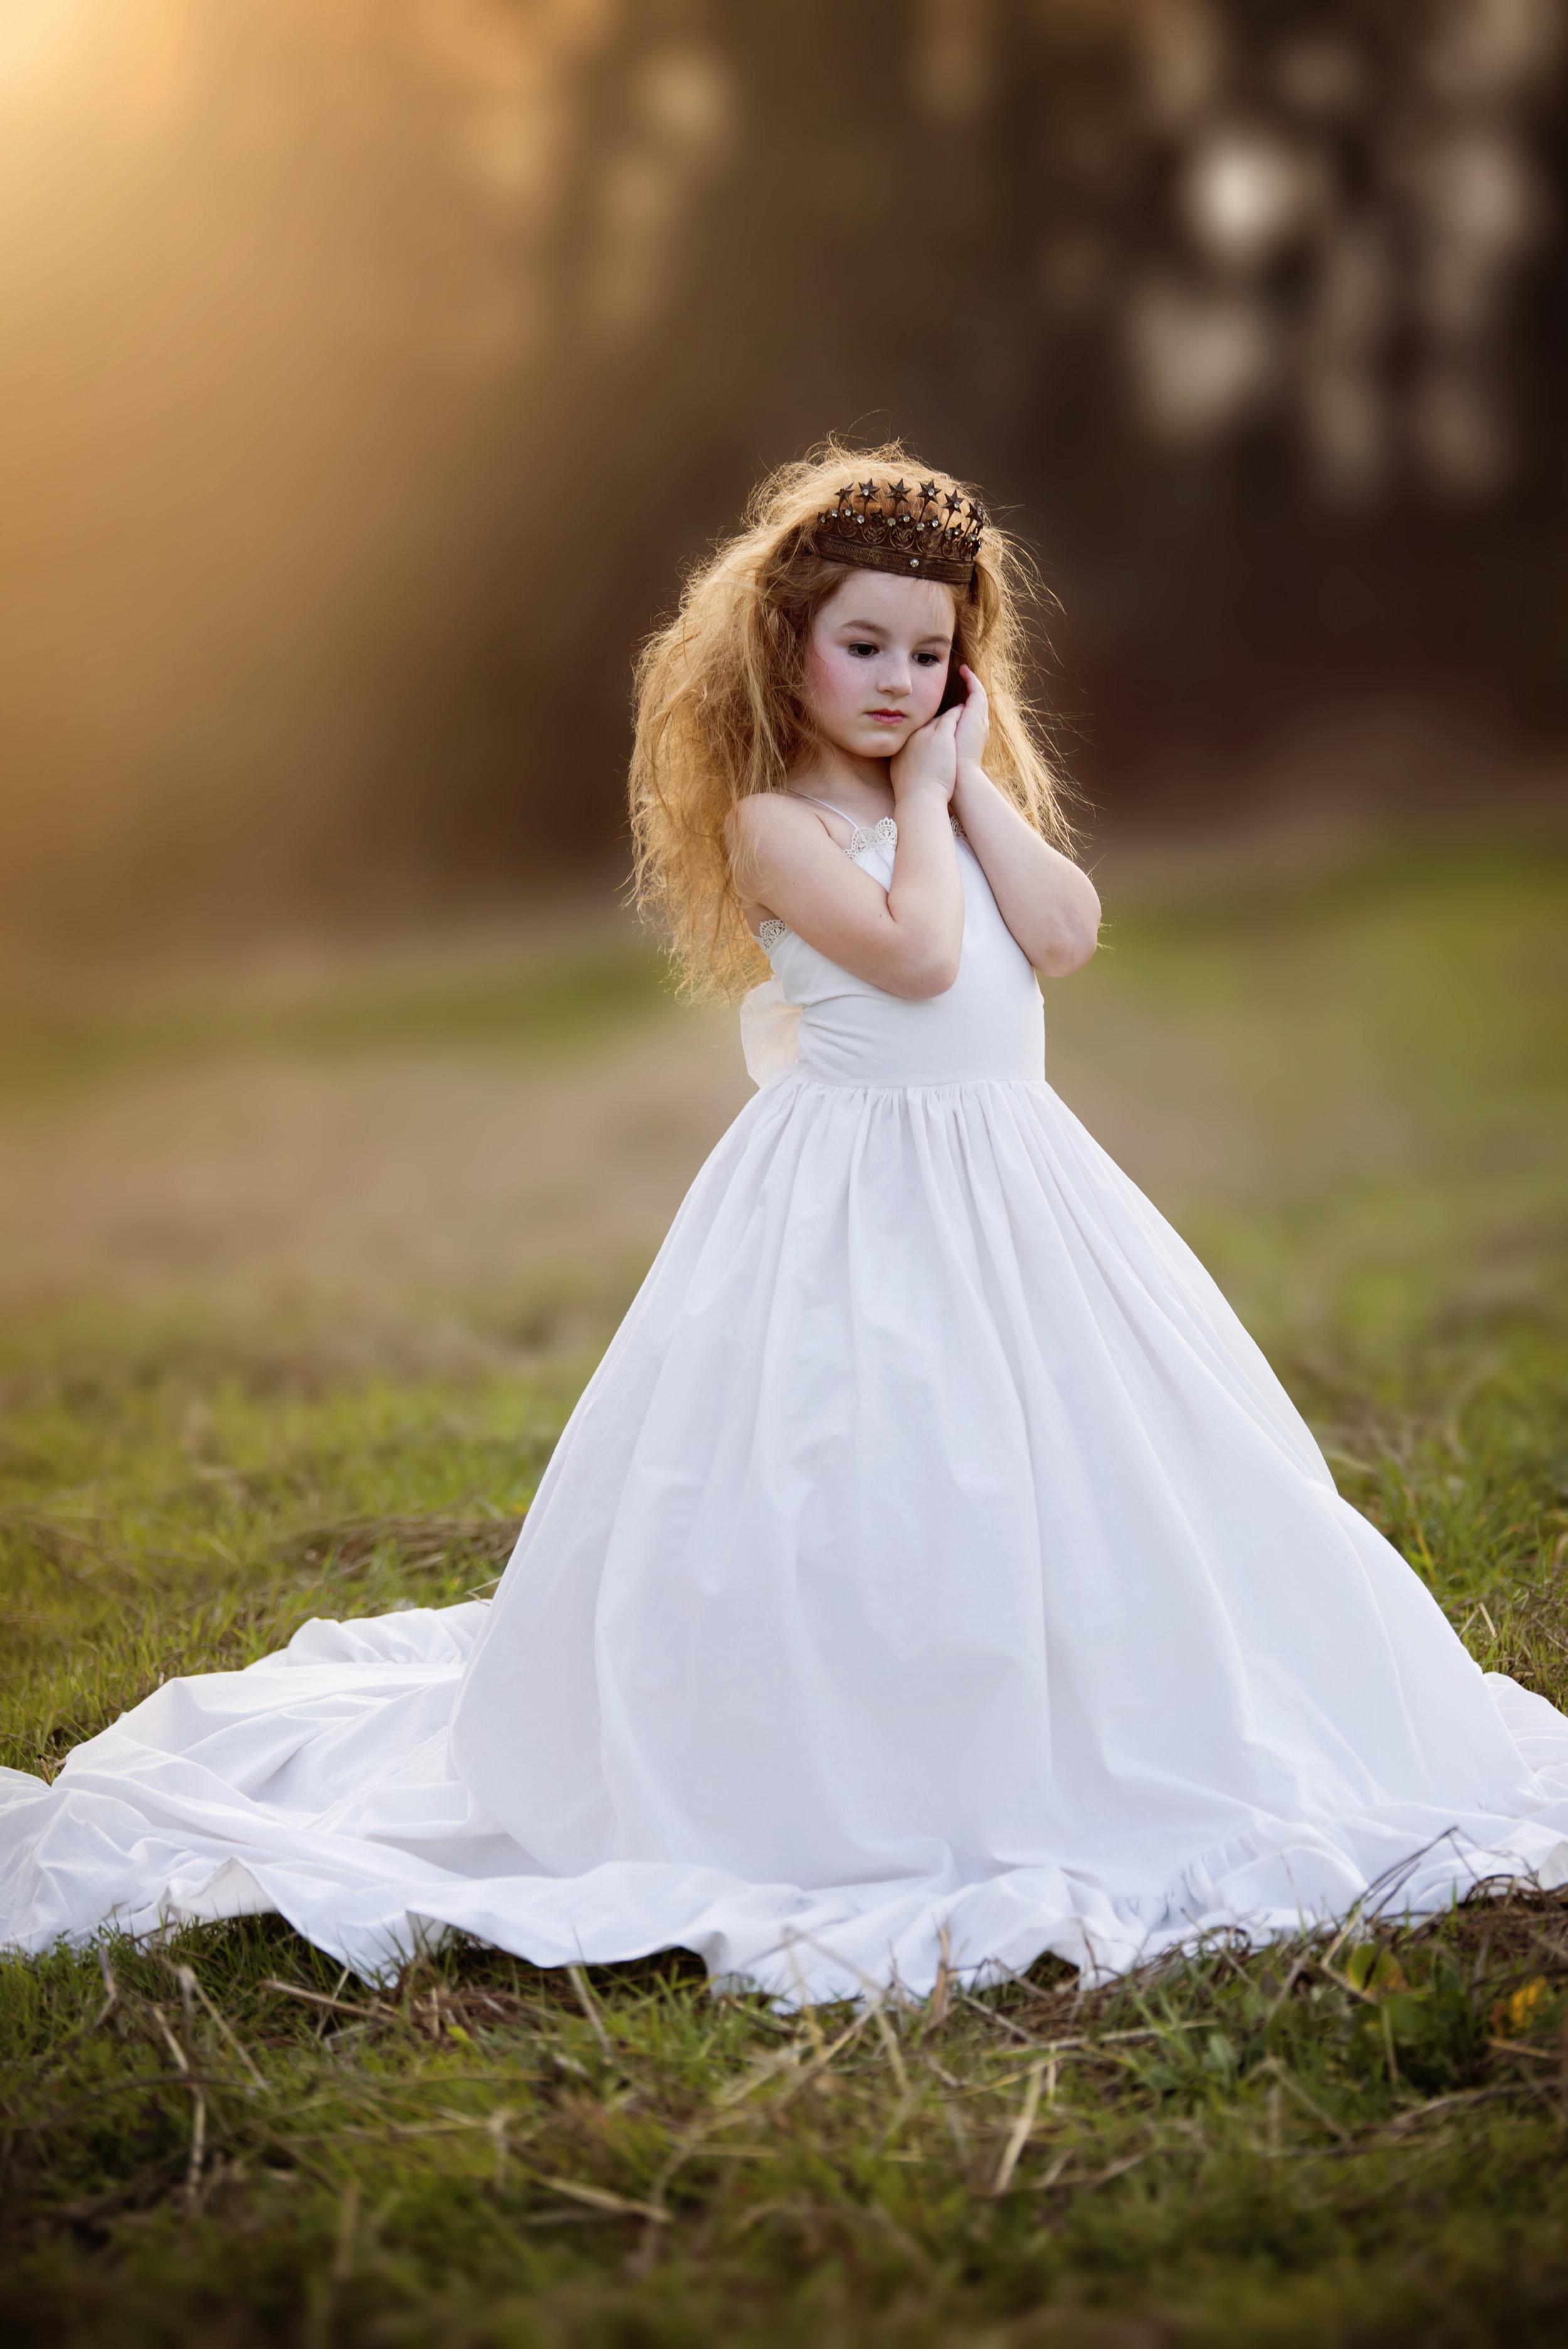 Reina-LeGrand-Photography-Photographer-Family-DFW-Dallas-Fort-Worth-Maren-Southlake-Colleyville-Grapevine-Roanoke-Keller-Westlake-Portrait-Portraiture-Photo-Session-julia-Children-Child-baby (2).jpg